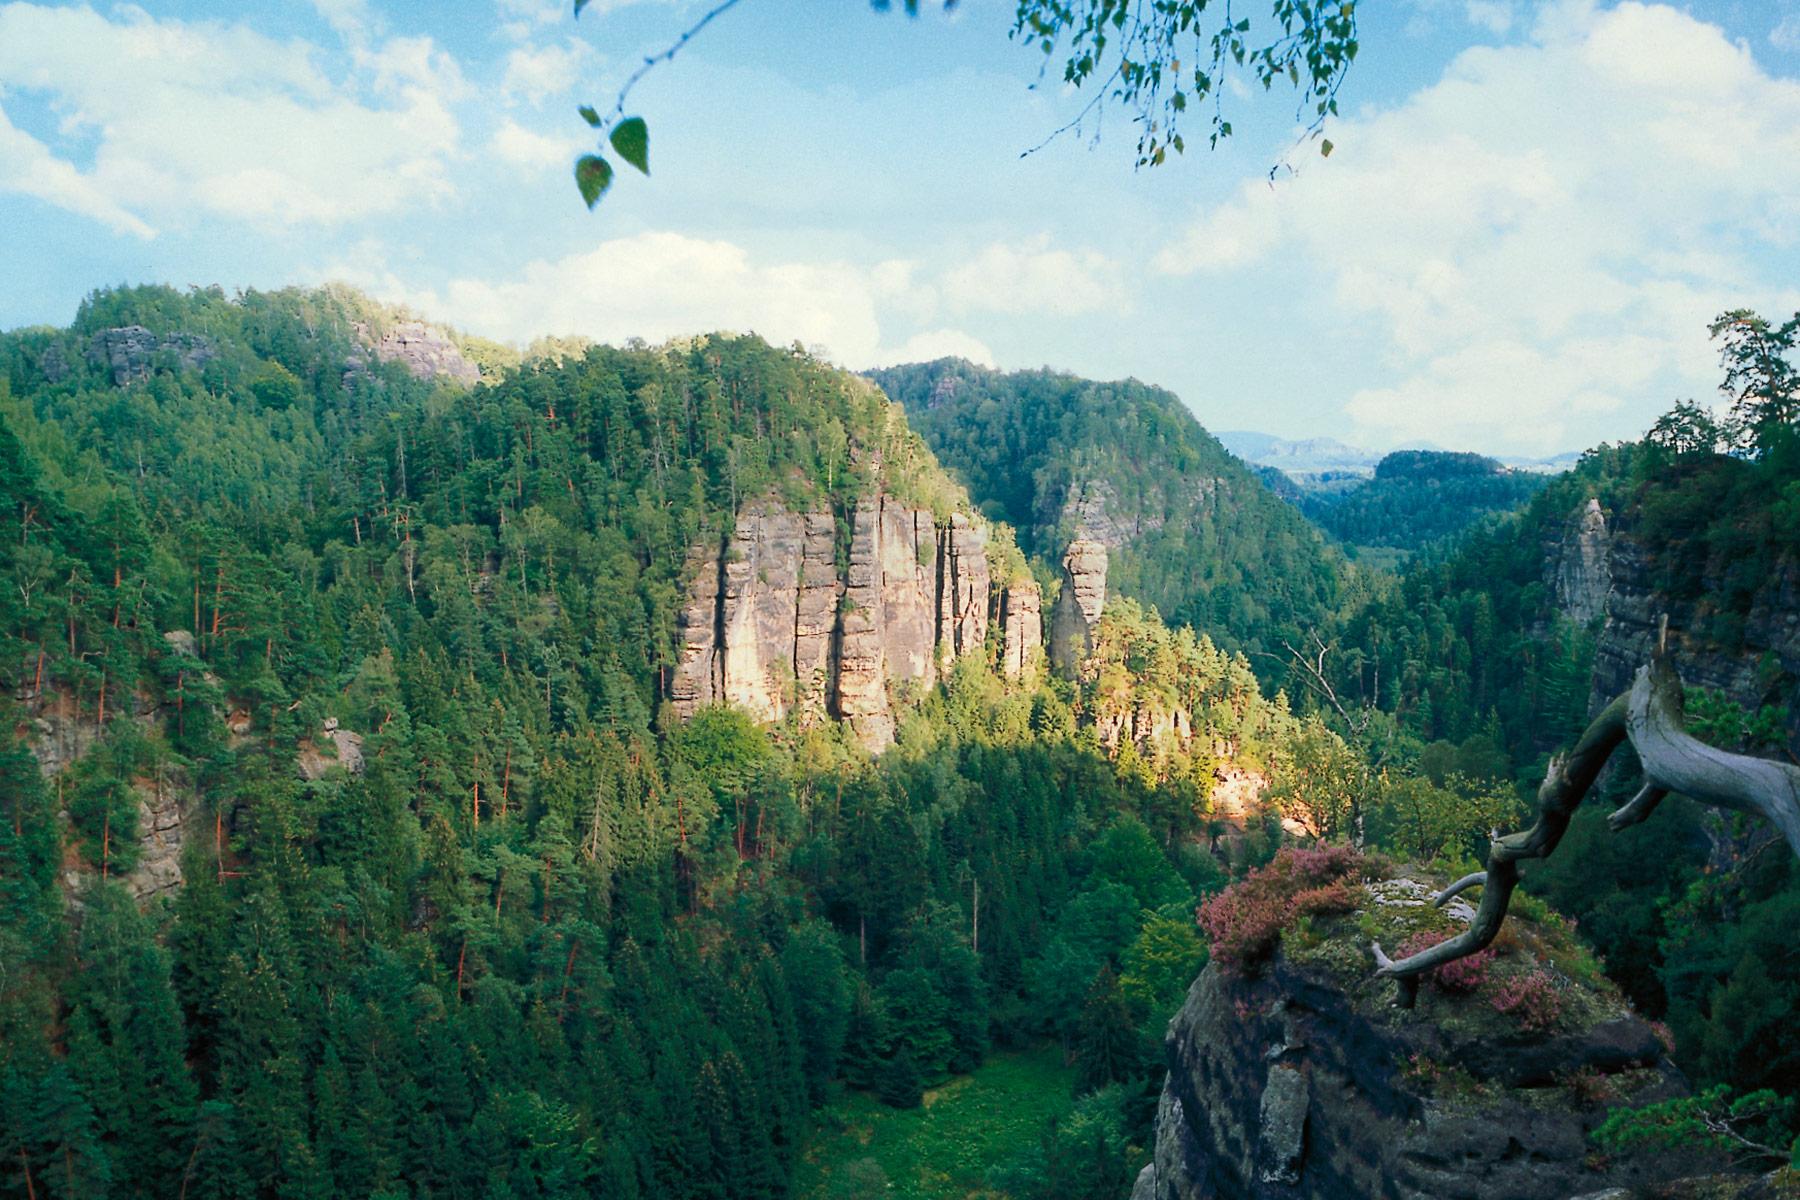 Felsen im Elbsandsteingebirge bei Bad Schandau